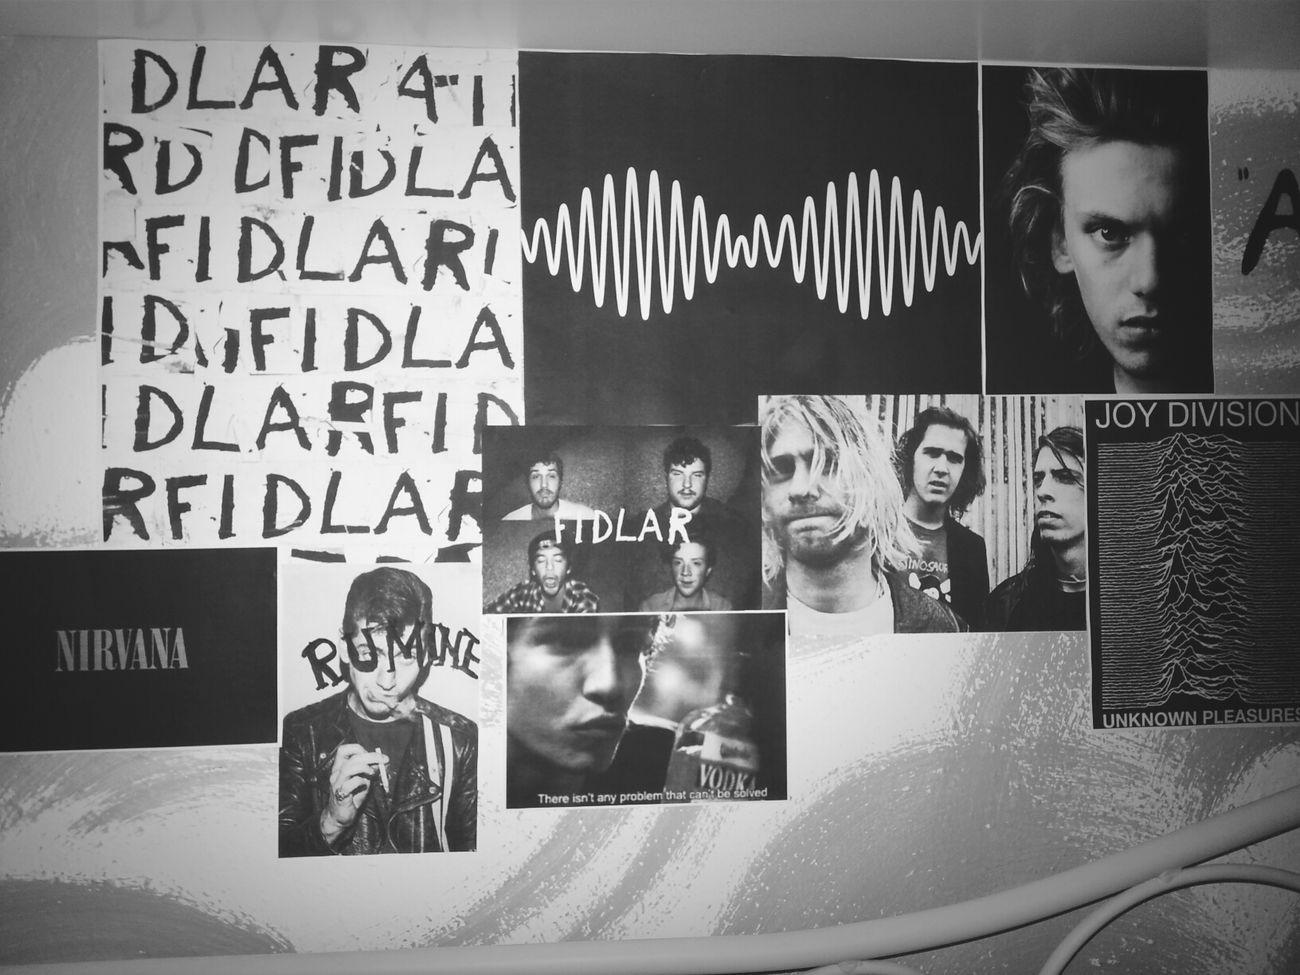 Meinebettwand Check This Out Nirvana . Fidlar #joydivision #arcticmonkeys